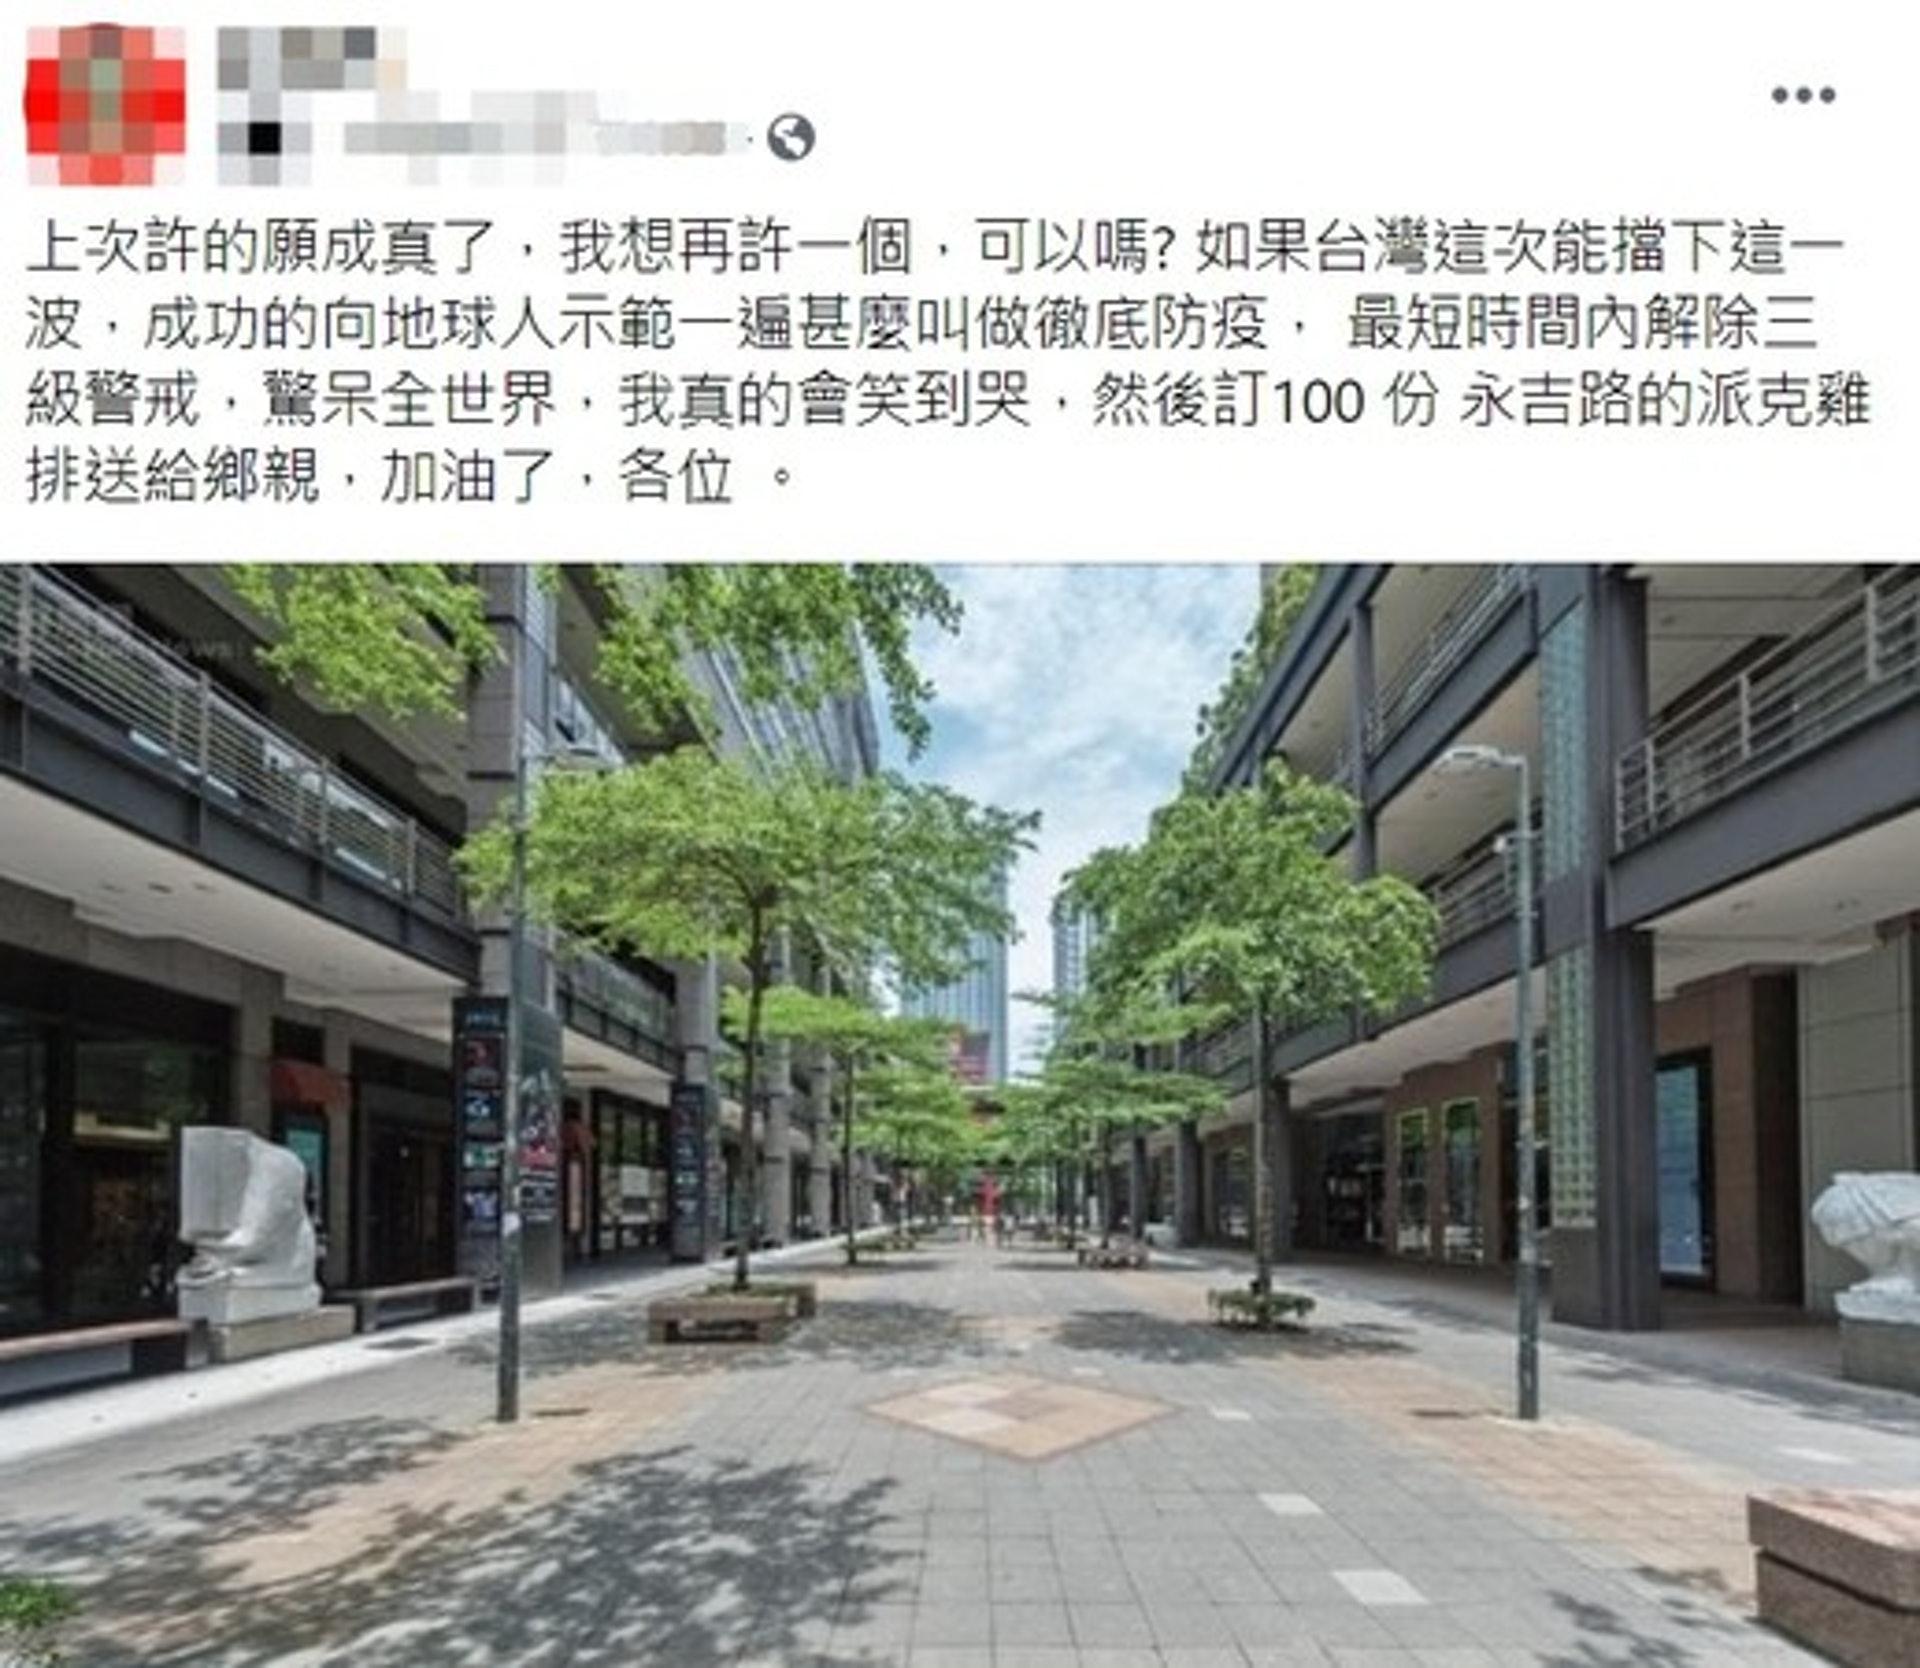 https://cdn.hk01.com/di/media/images/dw/20210522/472811433978761216983250.jpeg/ZyJrxSoXlu-CrJkLofq5EIg0XUvTar-PN7_LSTe_y0k?v=w1920